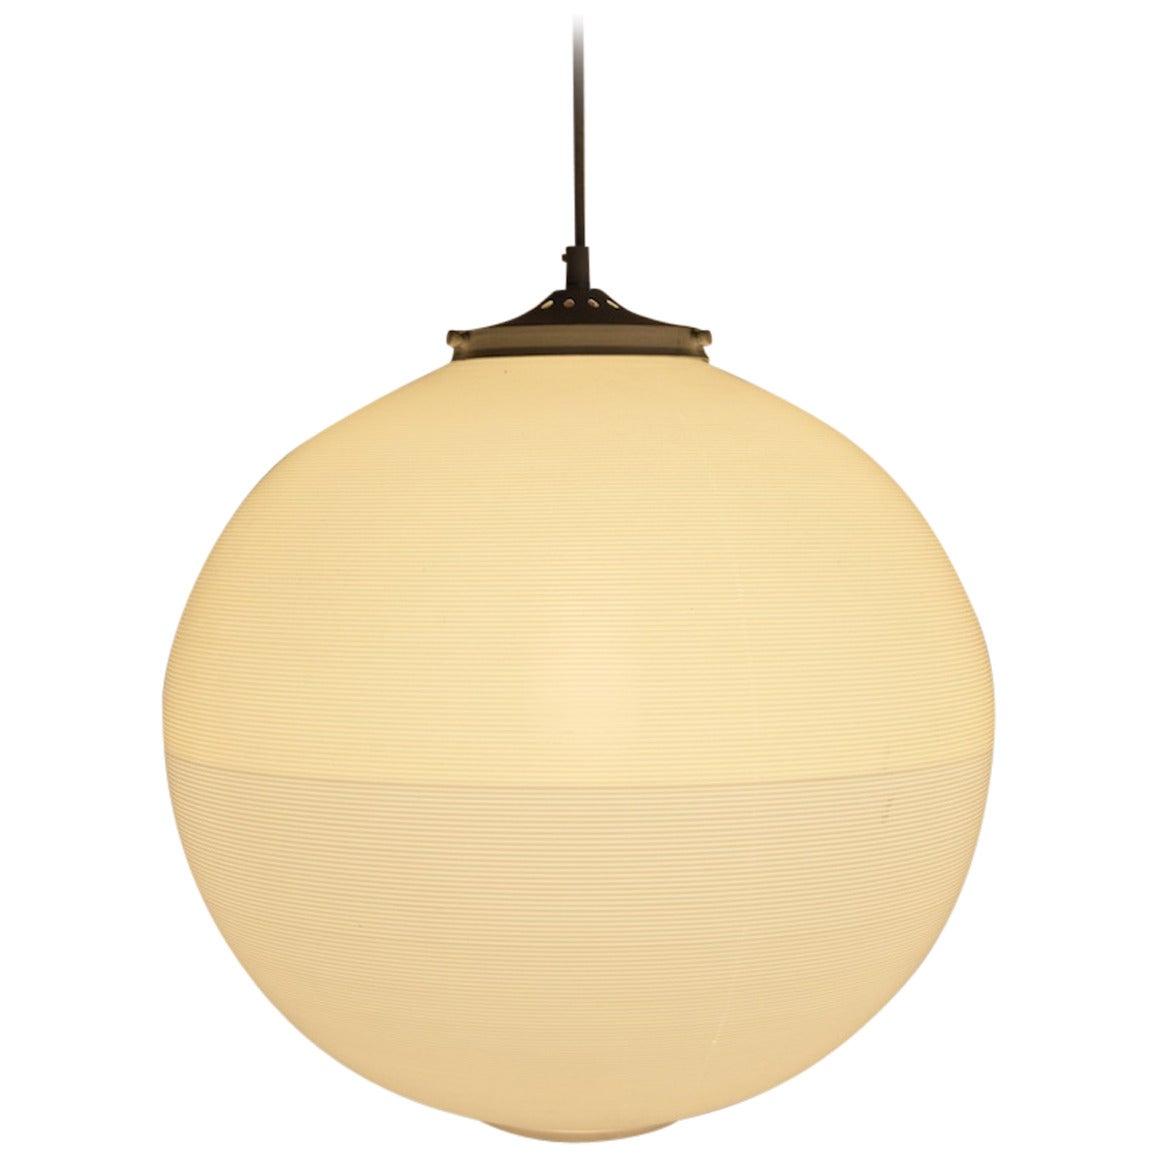 Unusual Heifetz Rotaflex Ball Form Globe